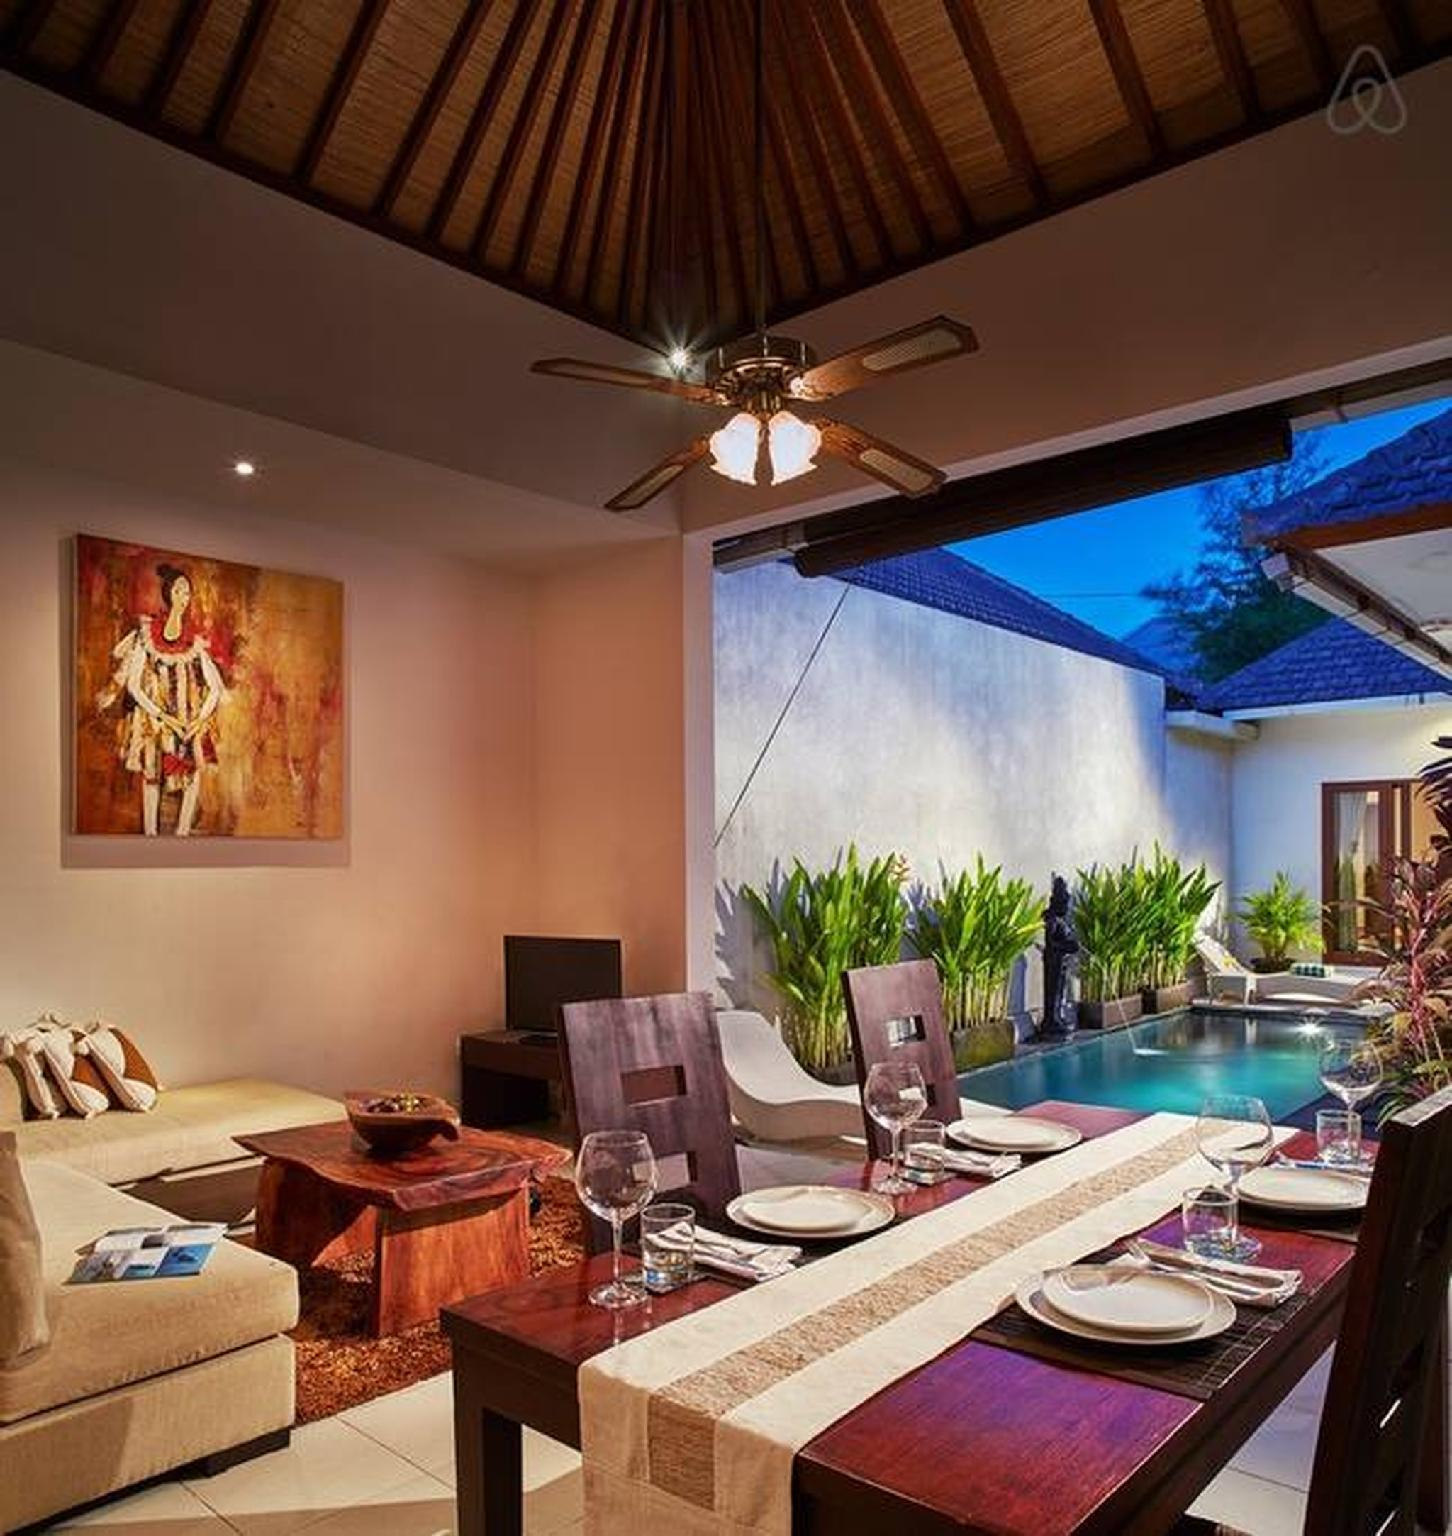 1BR Private villa seminyak